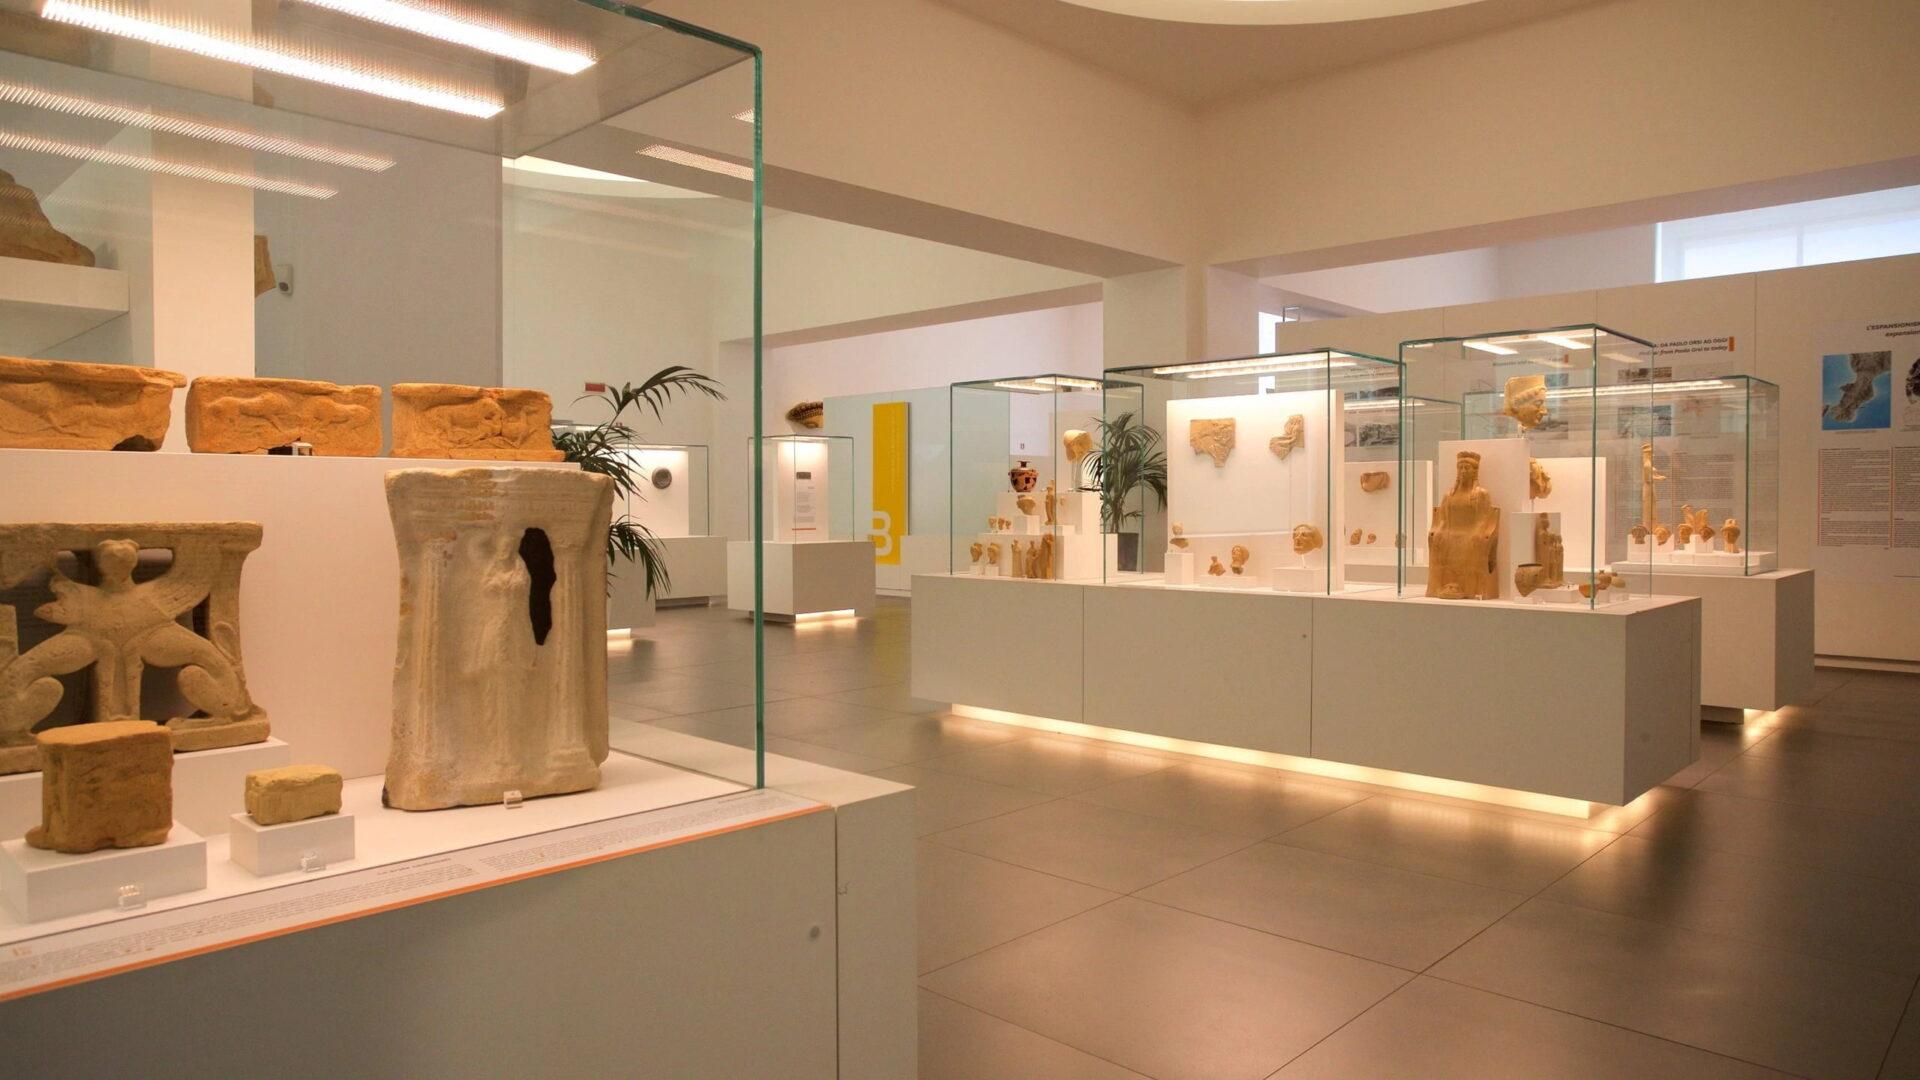 Archaeological Museum of Reggio Calabria